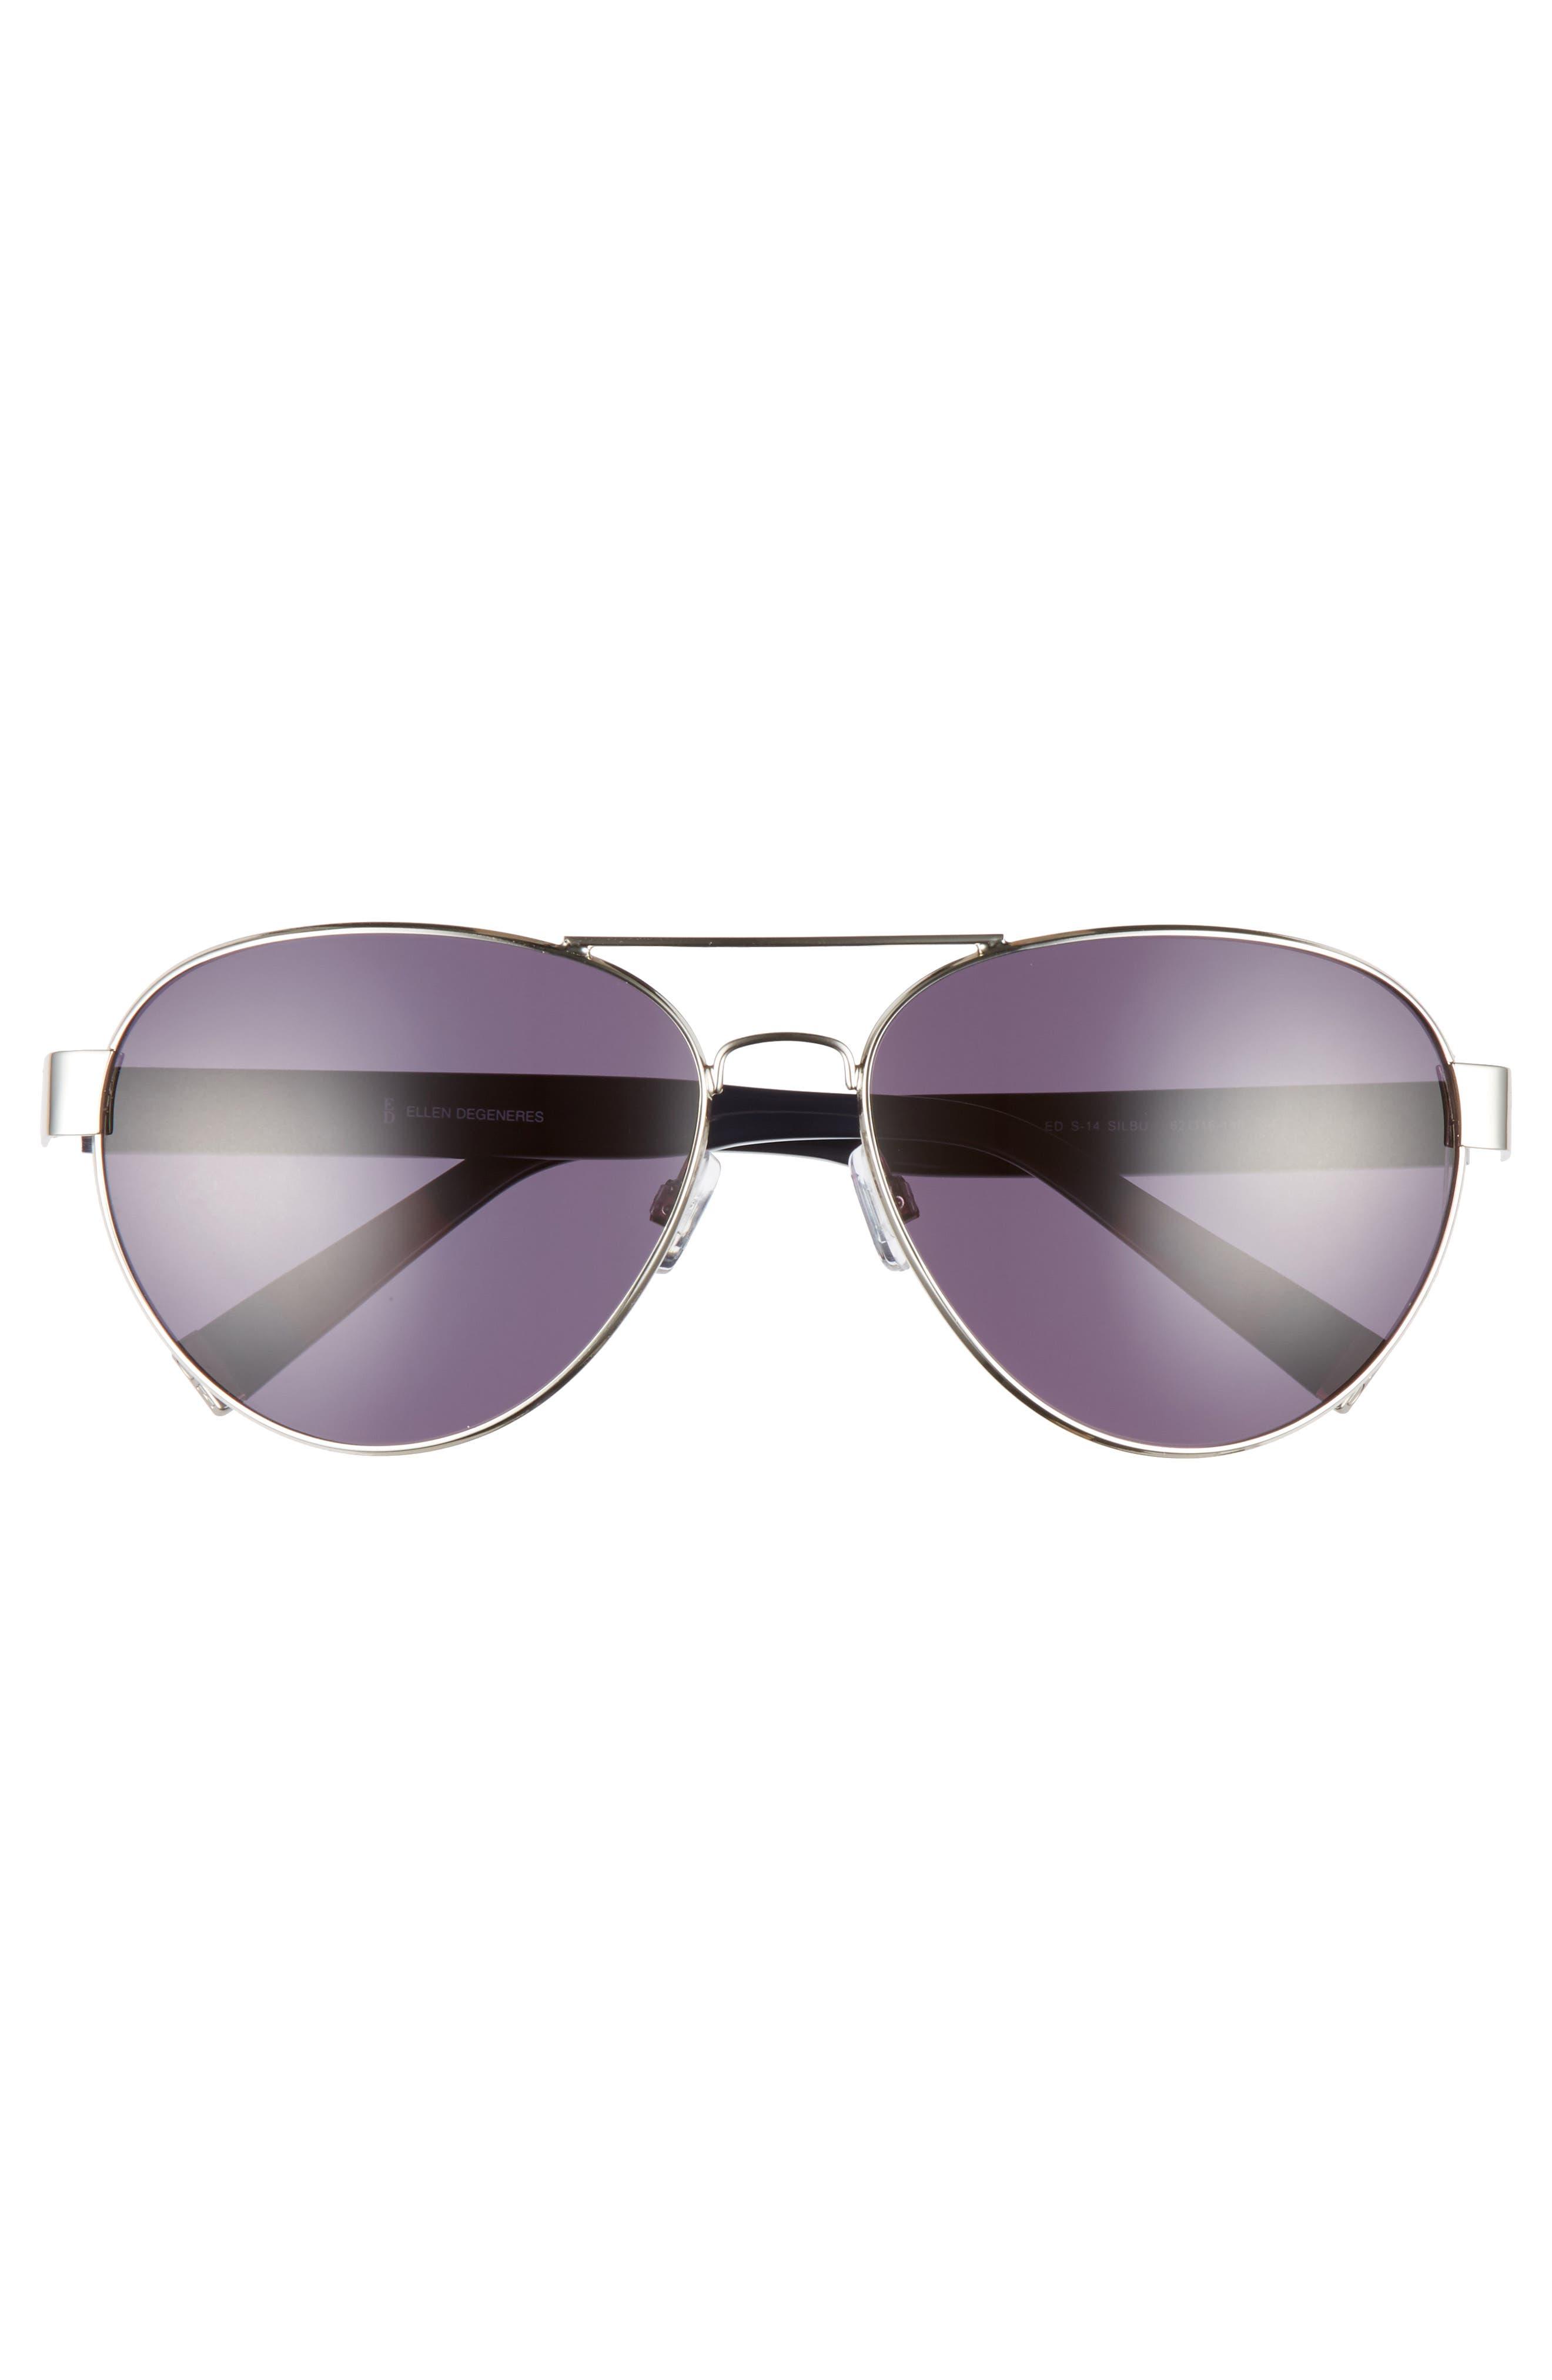 62mm Oversize Aviator Sunglasses,                             Alternate thumbnail 3, color,                             SILVER BLUE